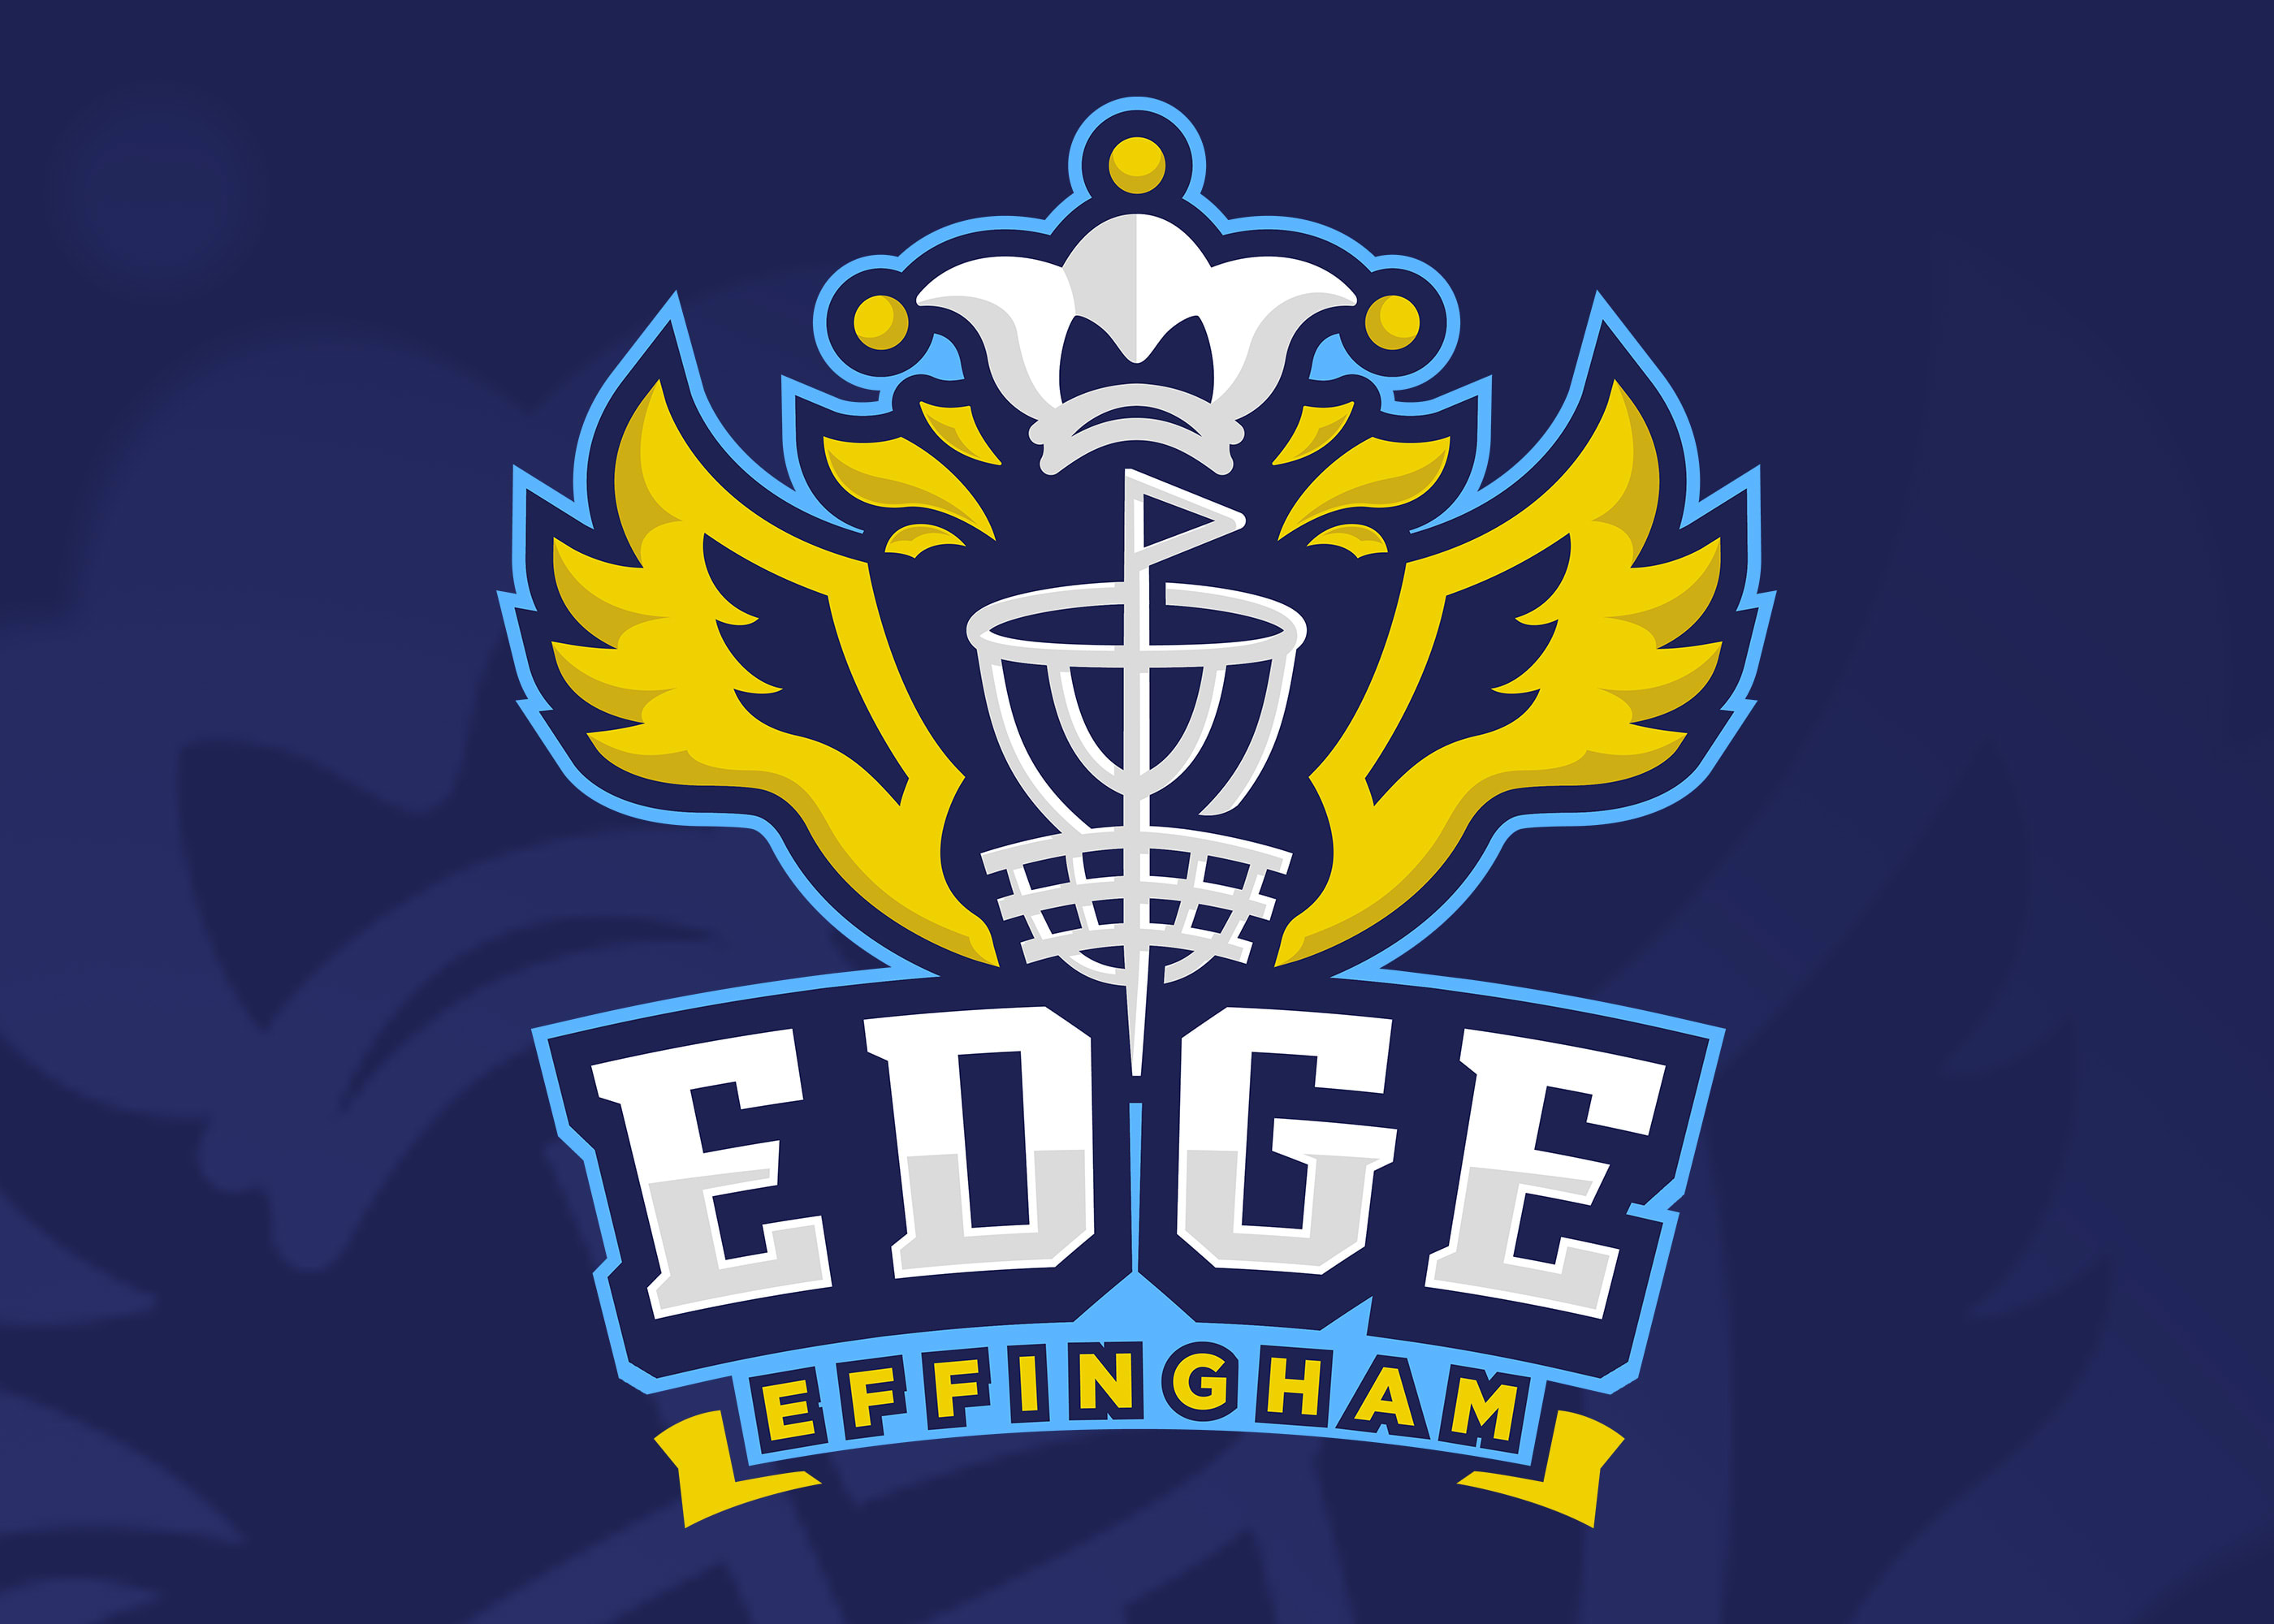 EDGE Effingham Disc Golf